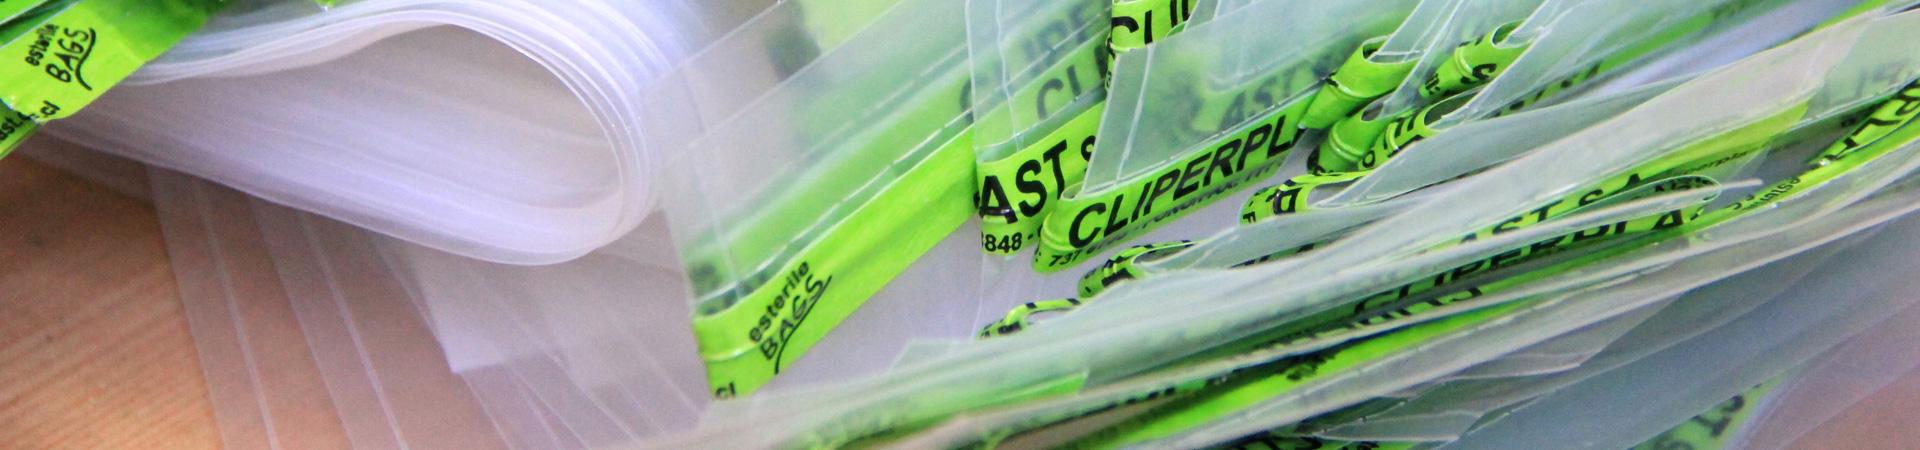 Cliperplast | Bolsas plásticas